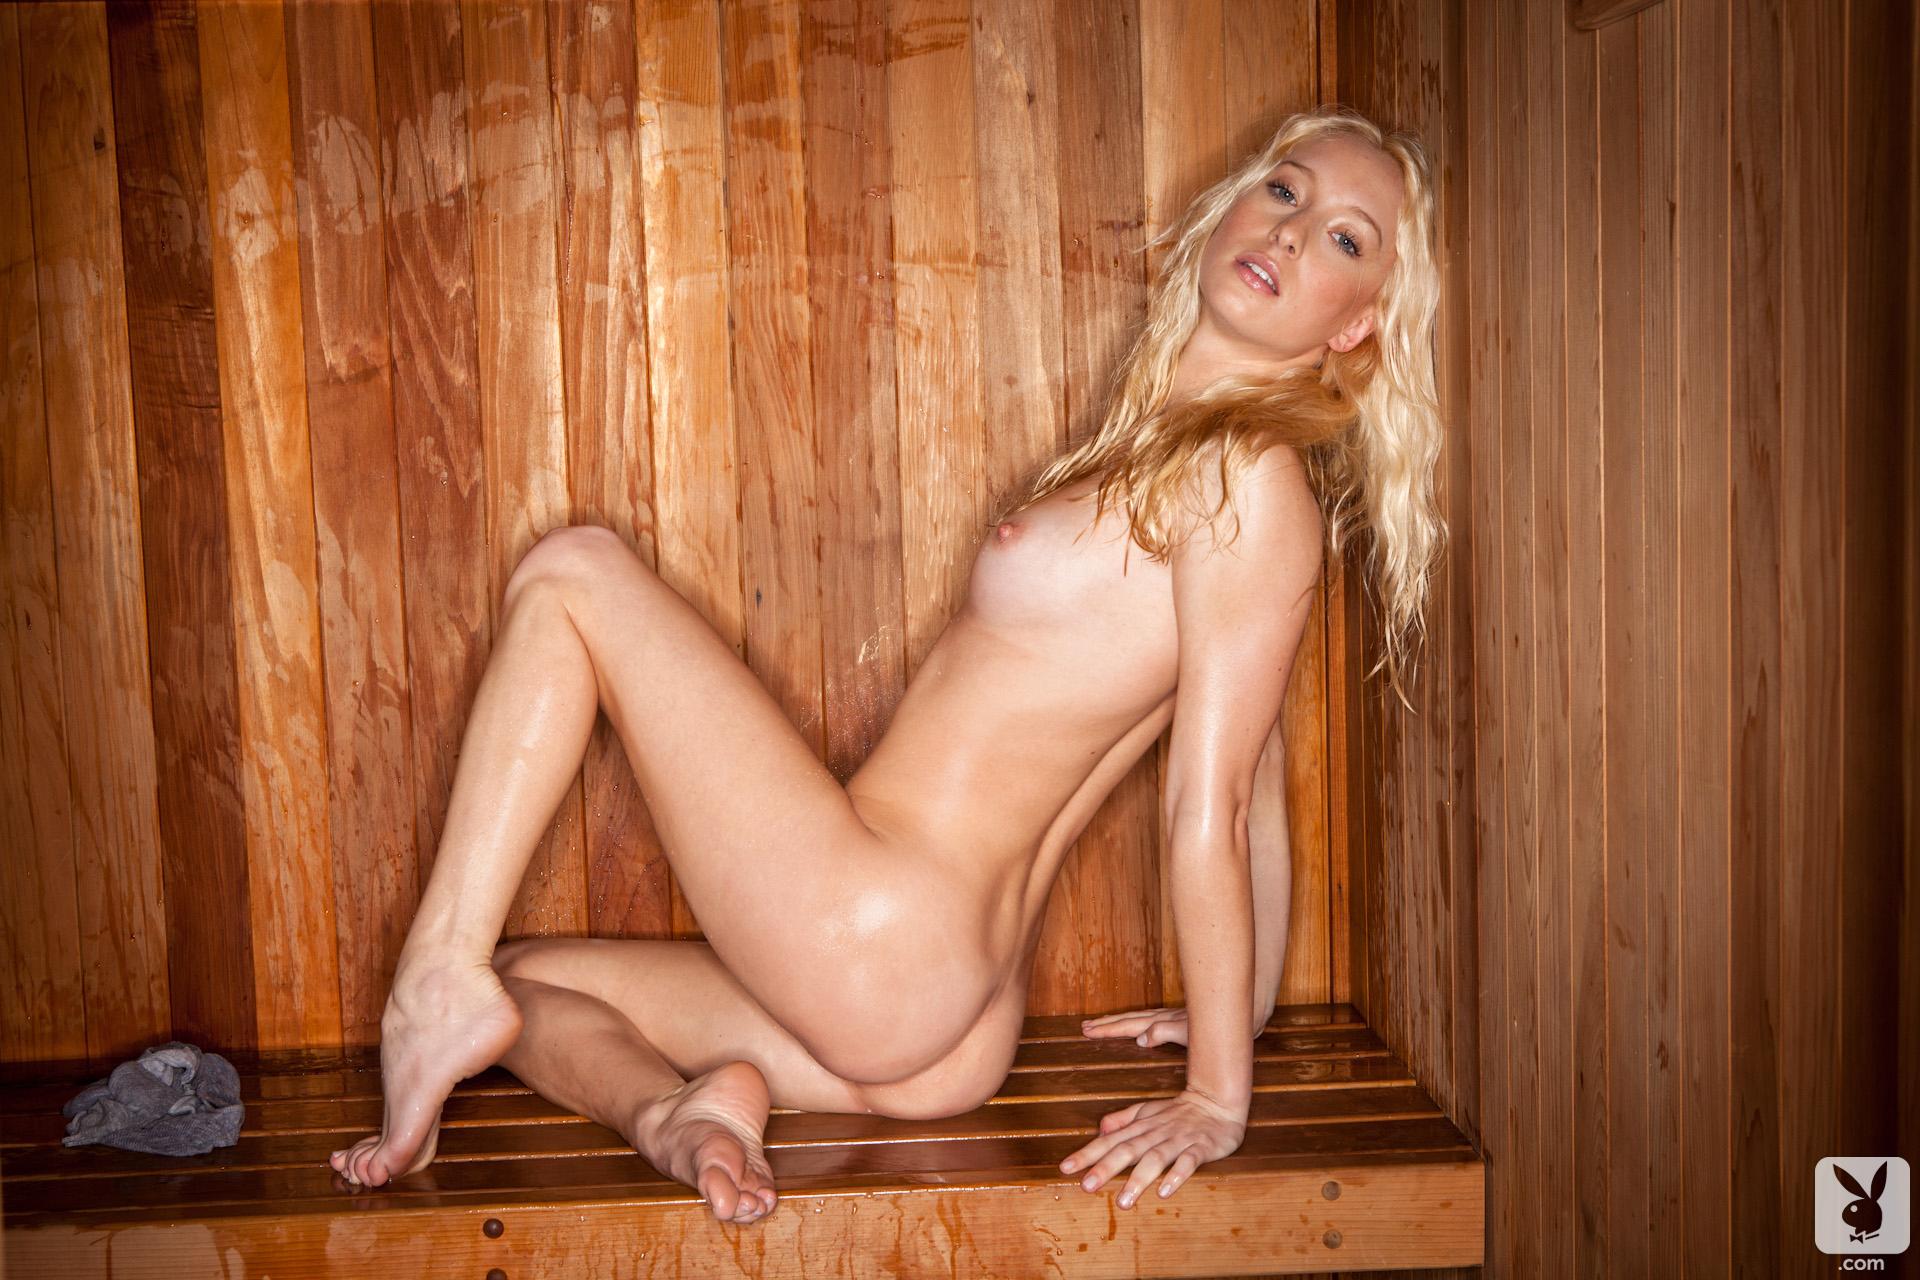 girls-nude-in-sauna-72